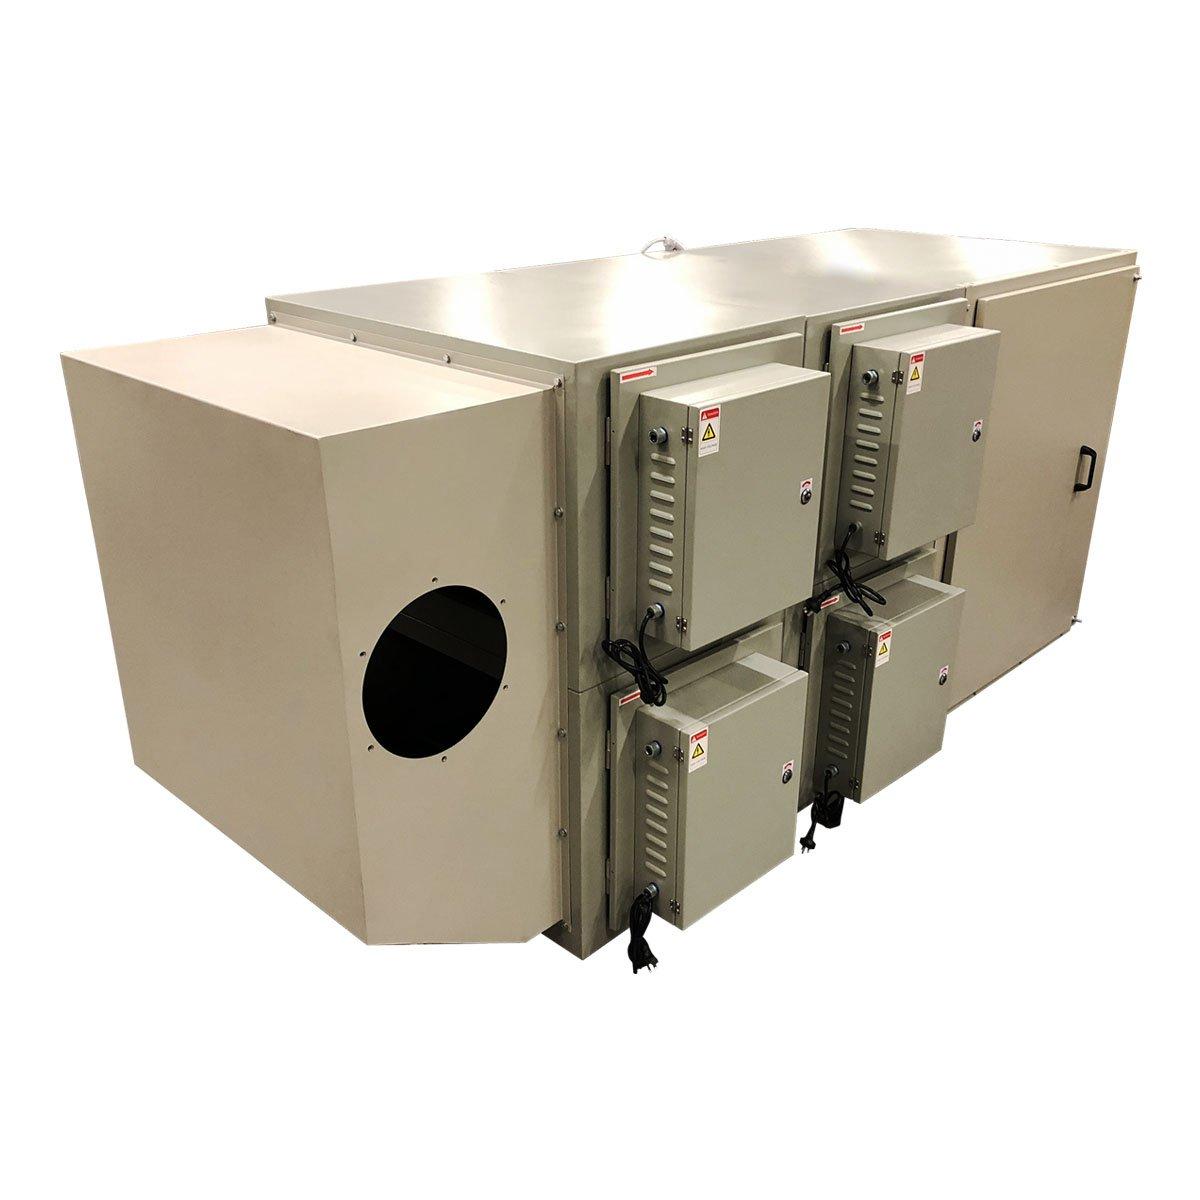 SMOG-HOG Modular electrostatic filters